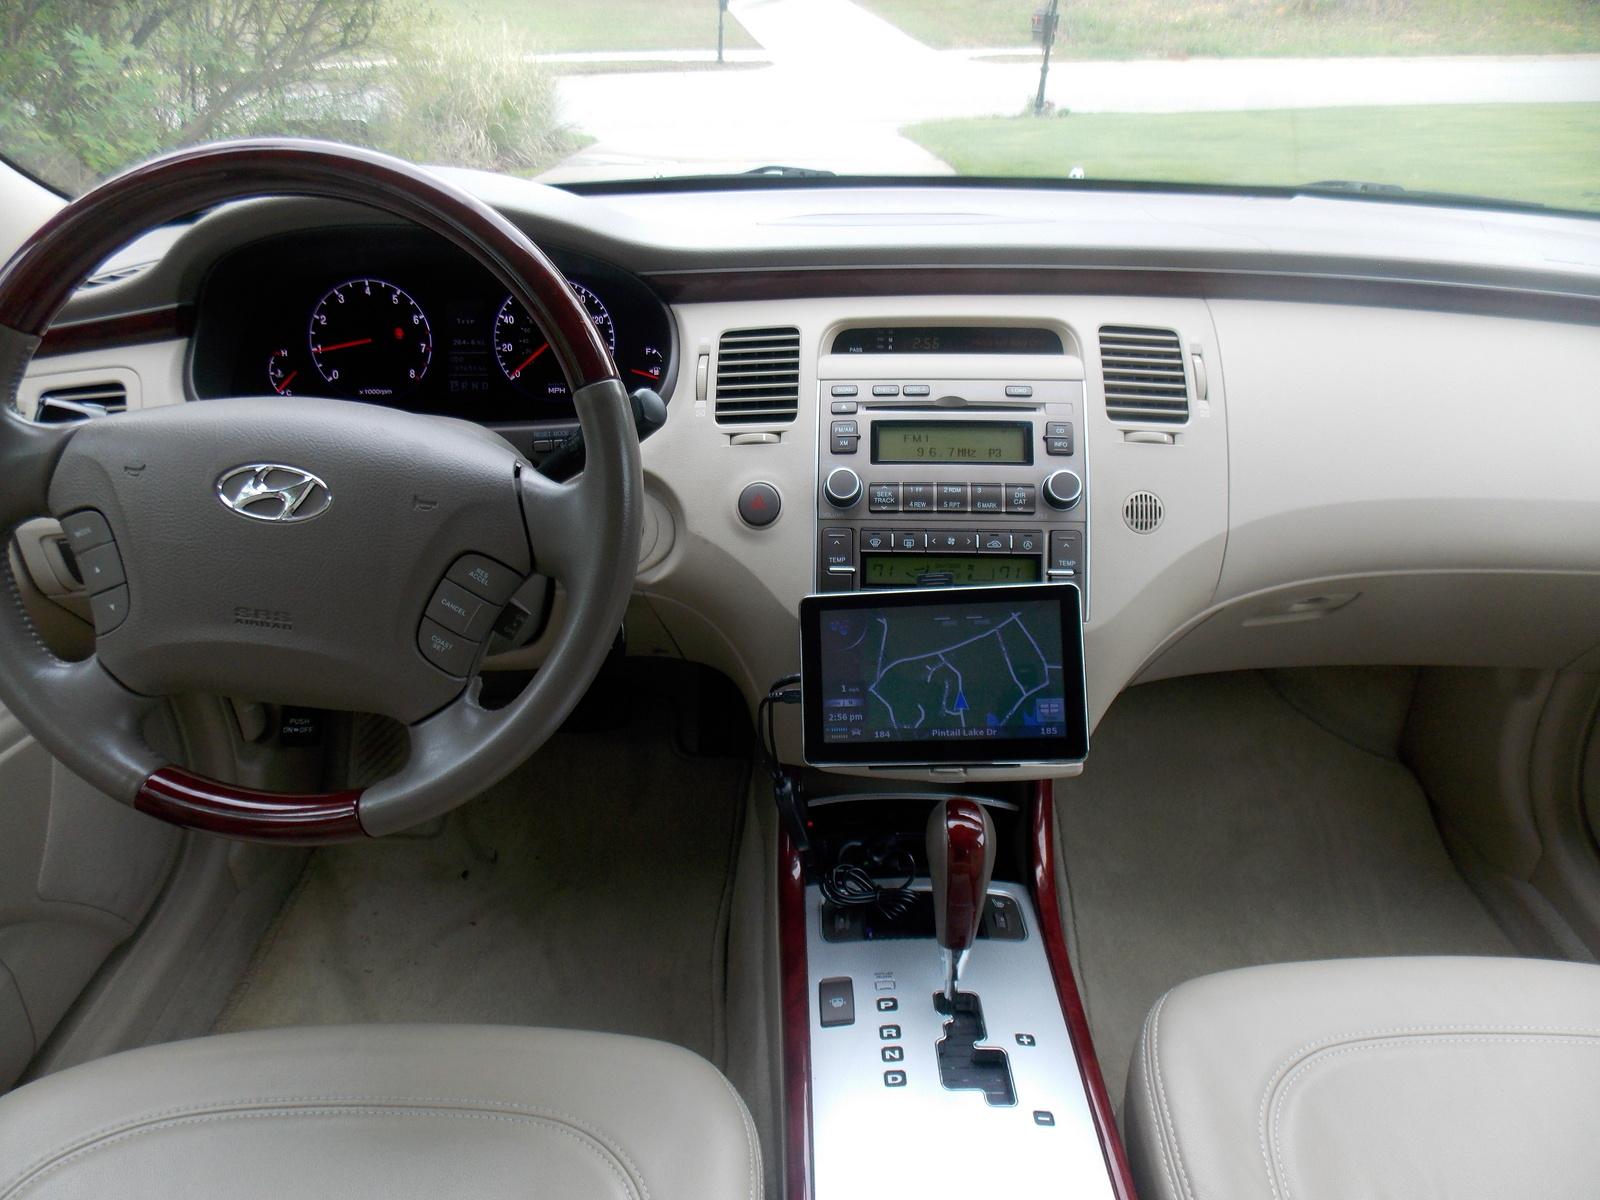 2007 Hyundai Azera Pictures Cargurus